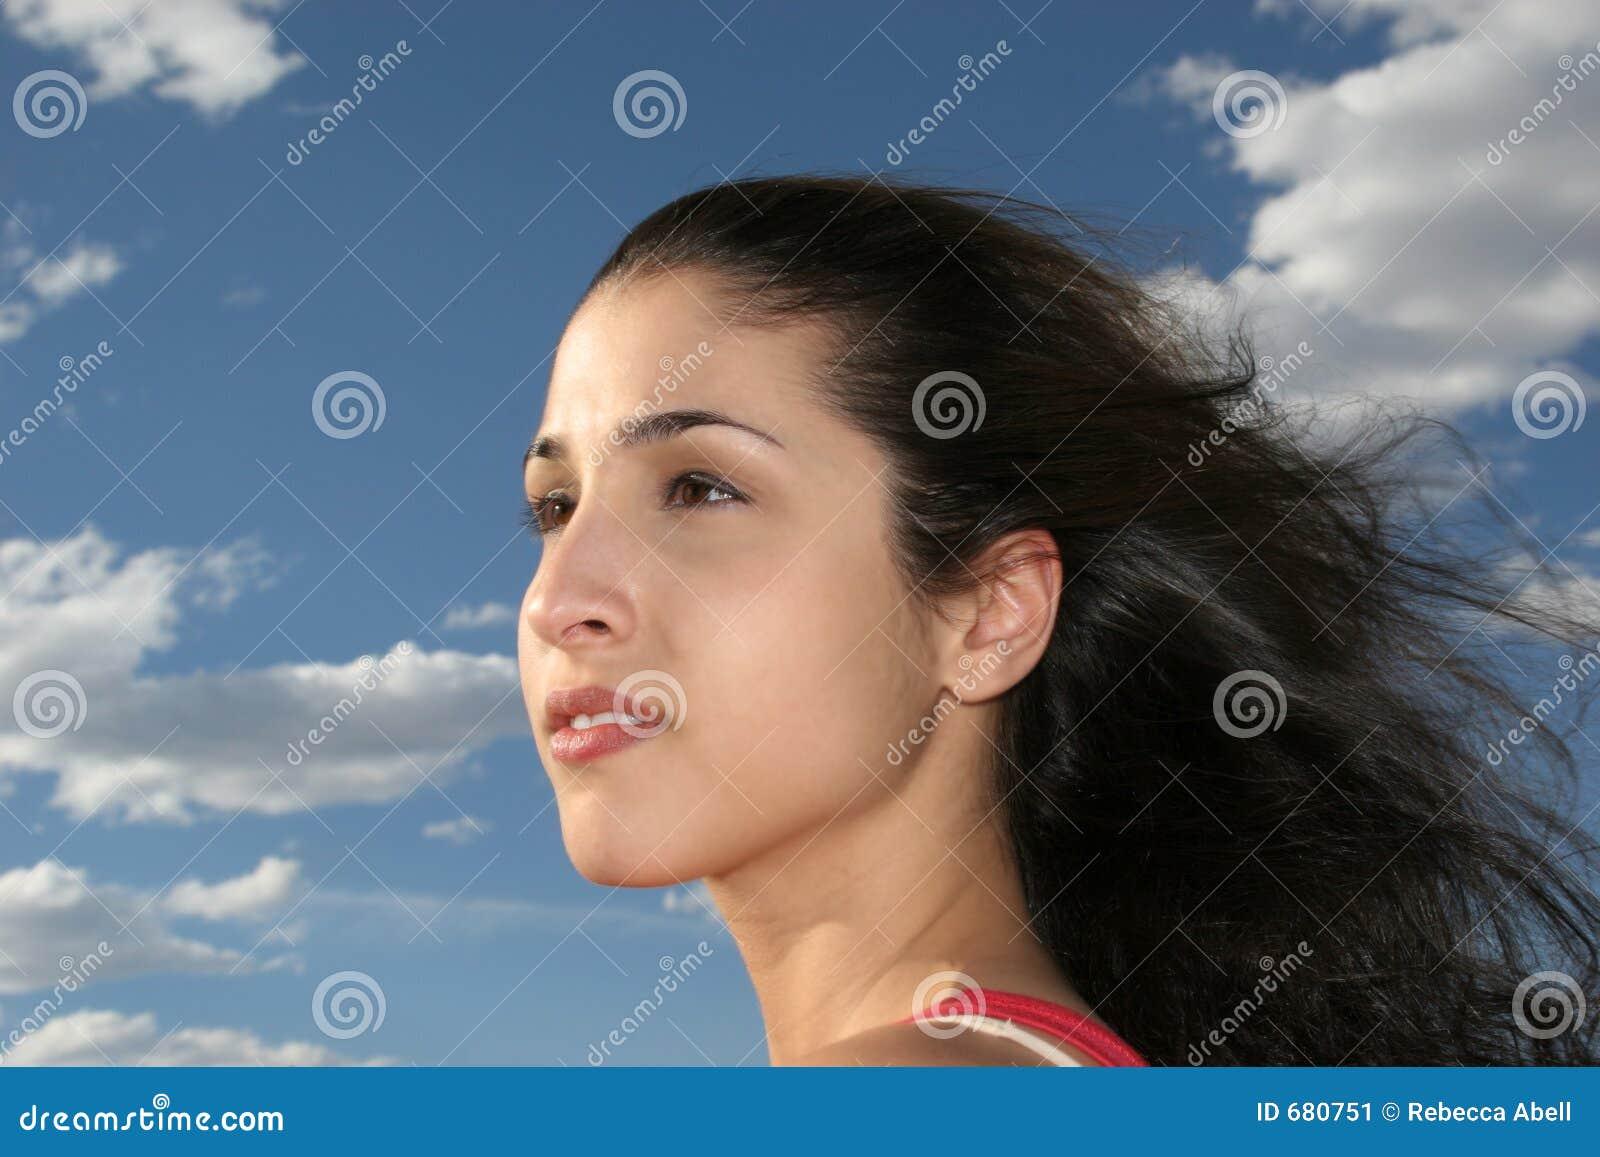 mulher-sonhadora-bonita-grega-680751.jpg